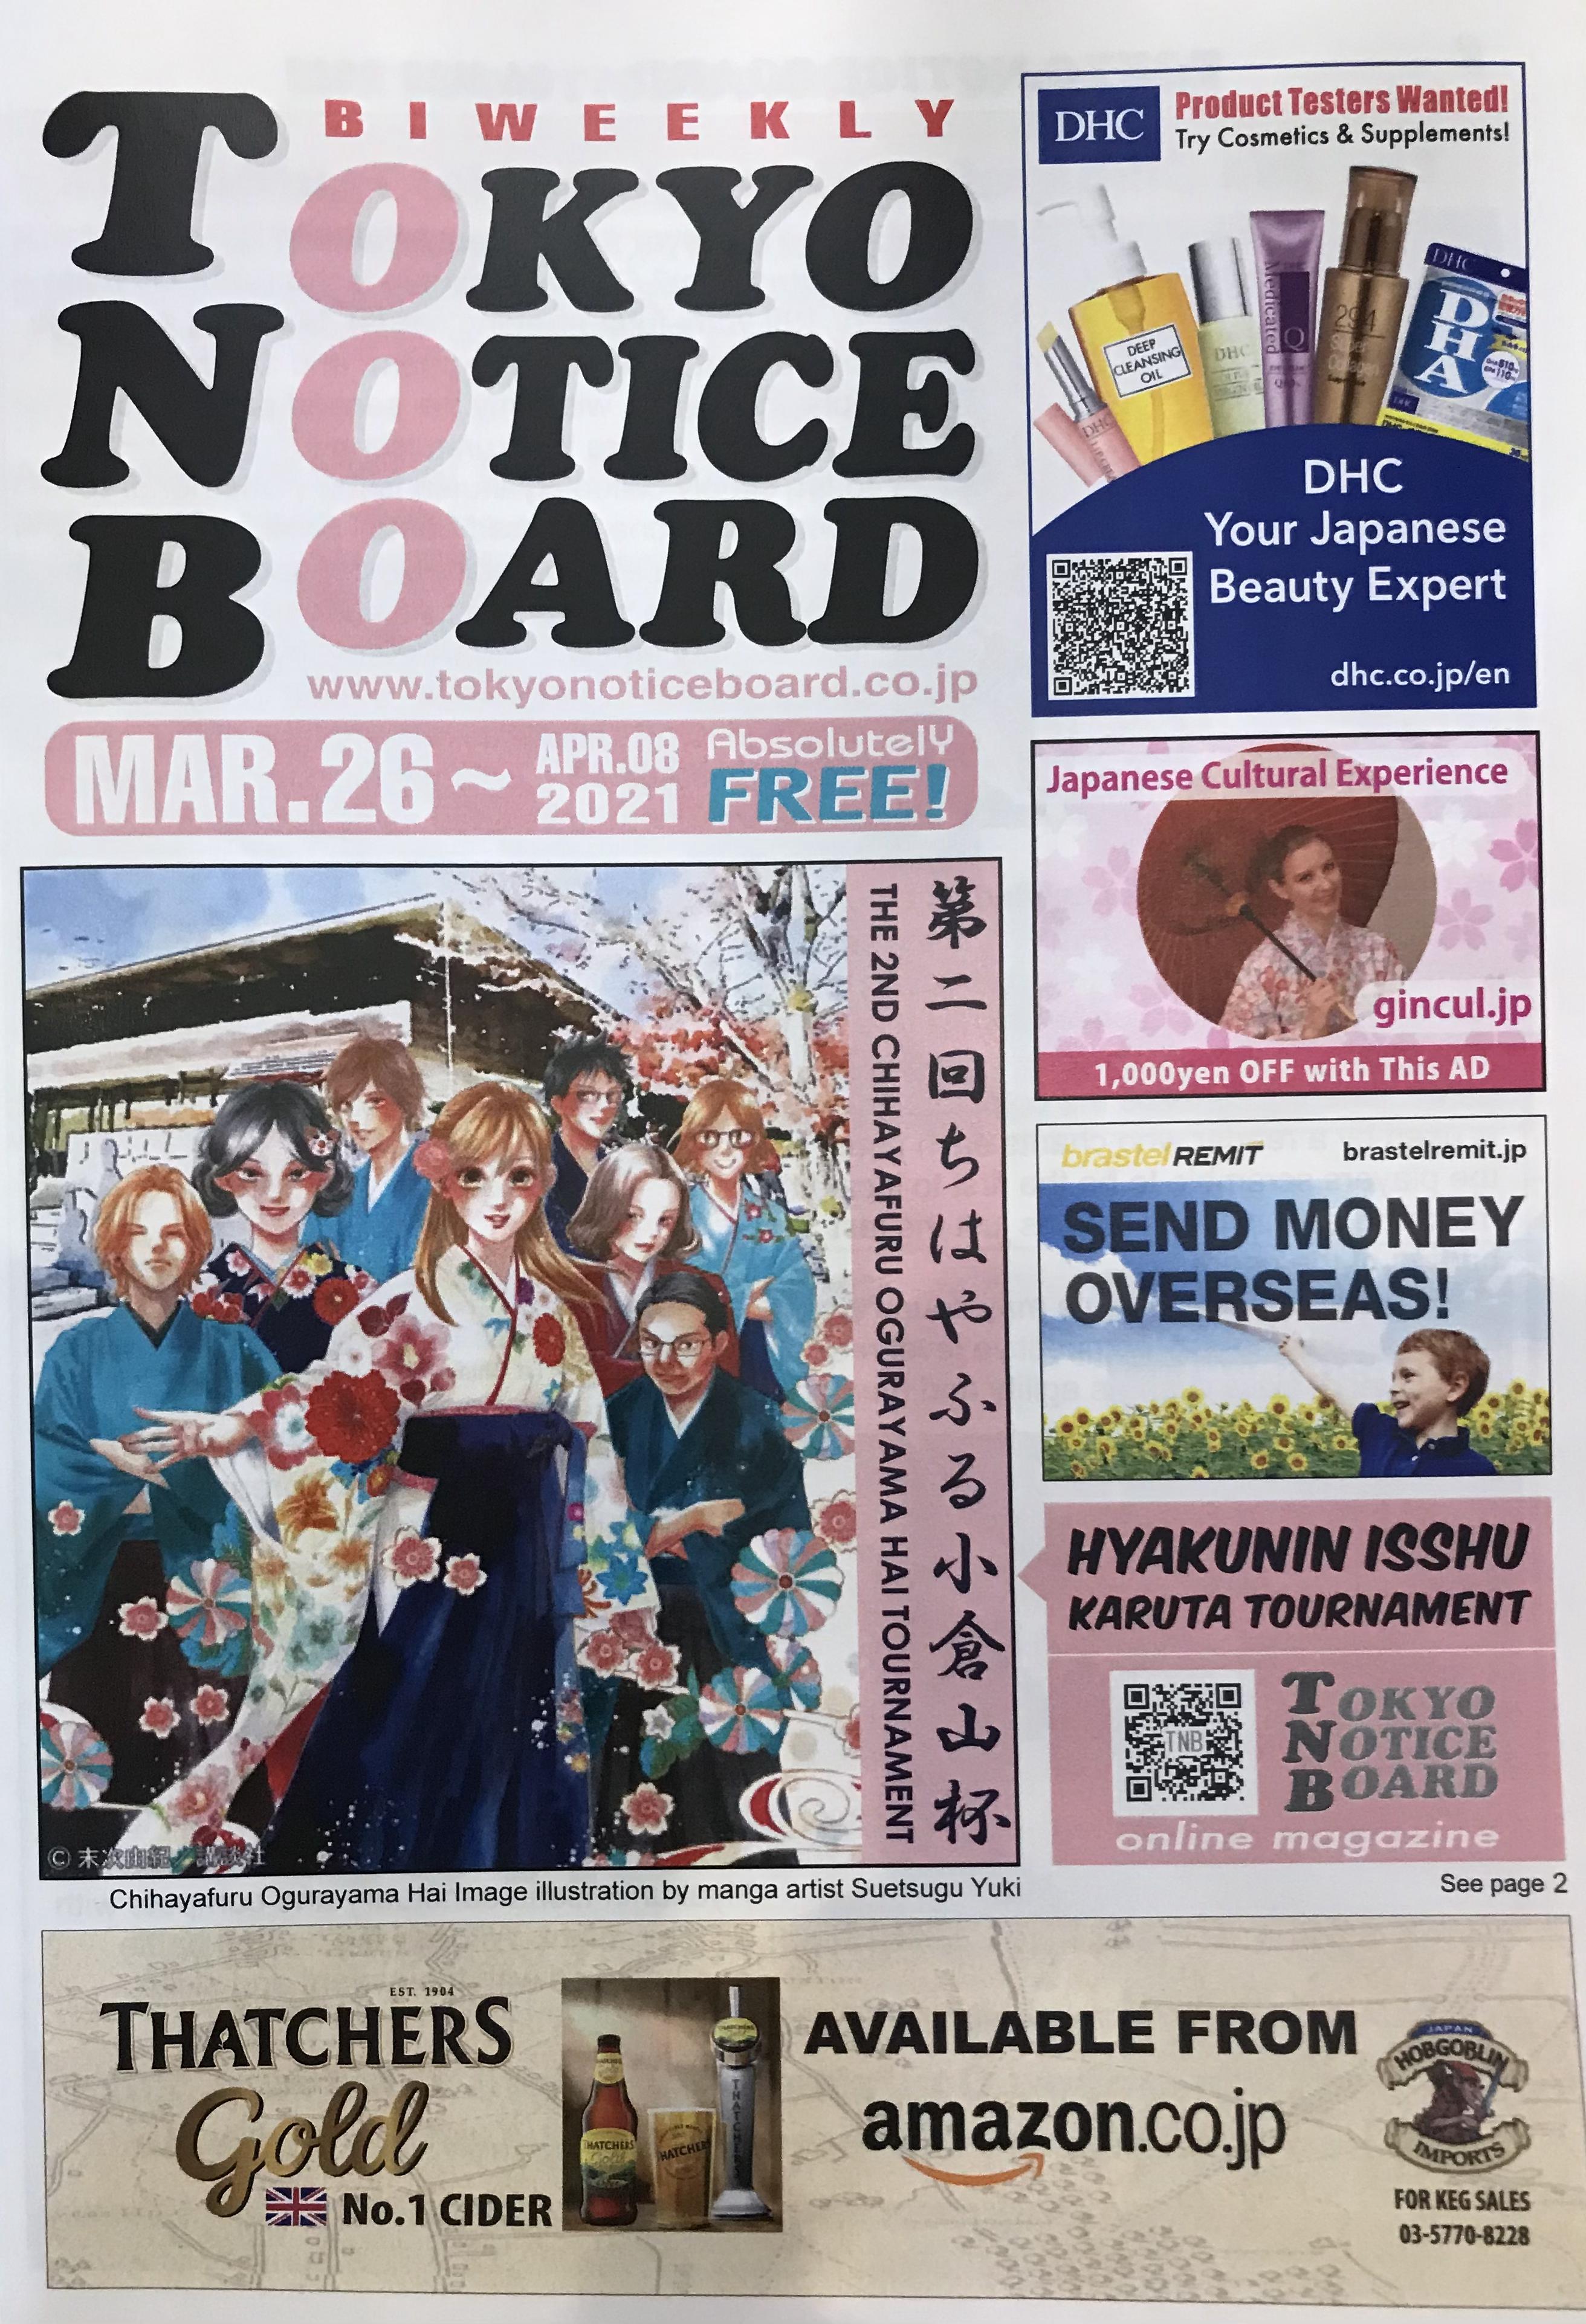 Tokyo Notice Board front page